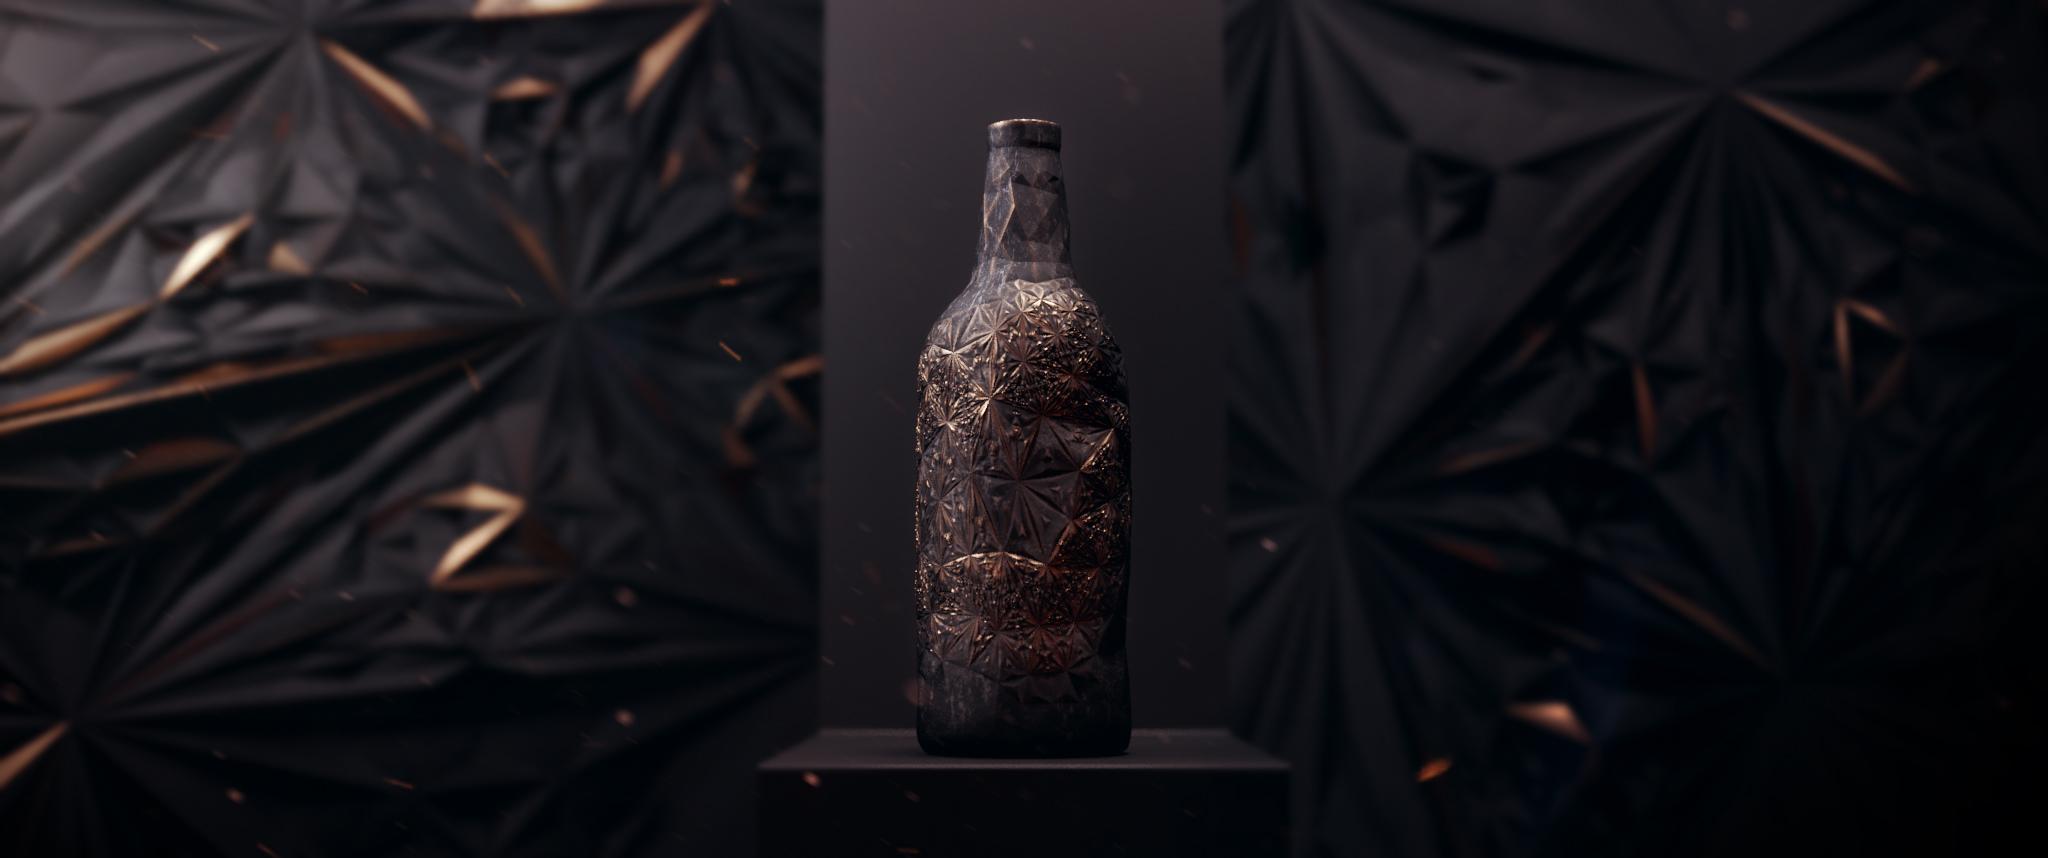 VarSubD_Bottle_LockUp_001.jpg